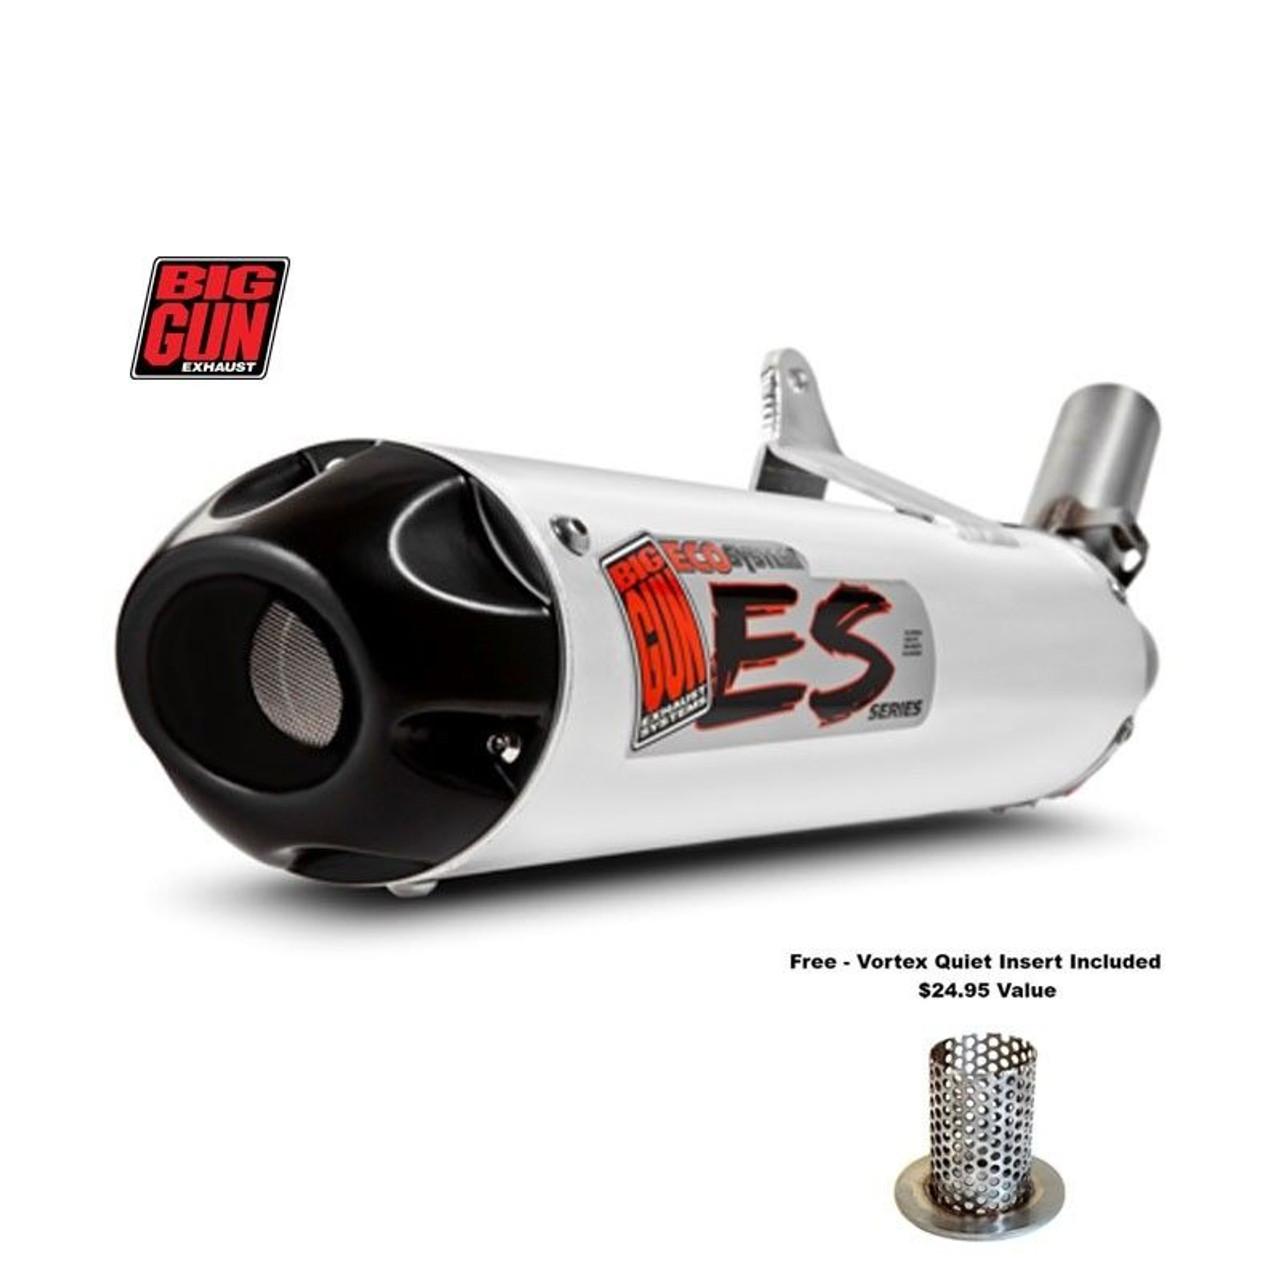 Big Gun Exhaust Eco Atv Slip On Pipe Suzuki Ltr 450 Ltr450 2006-2010